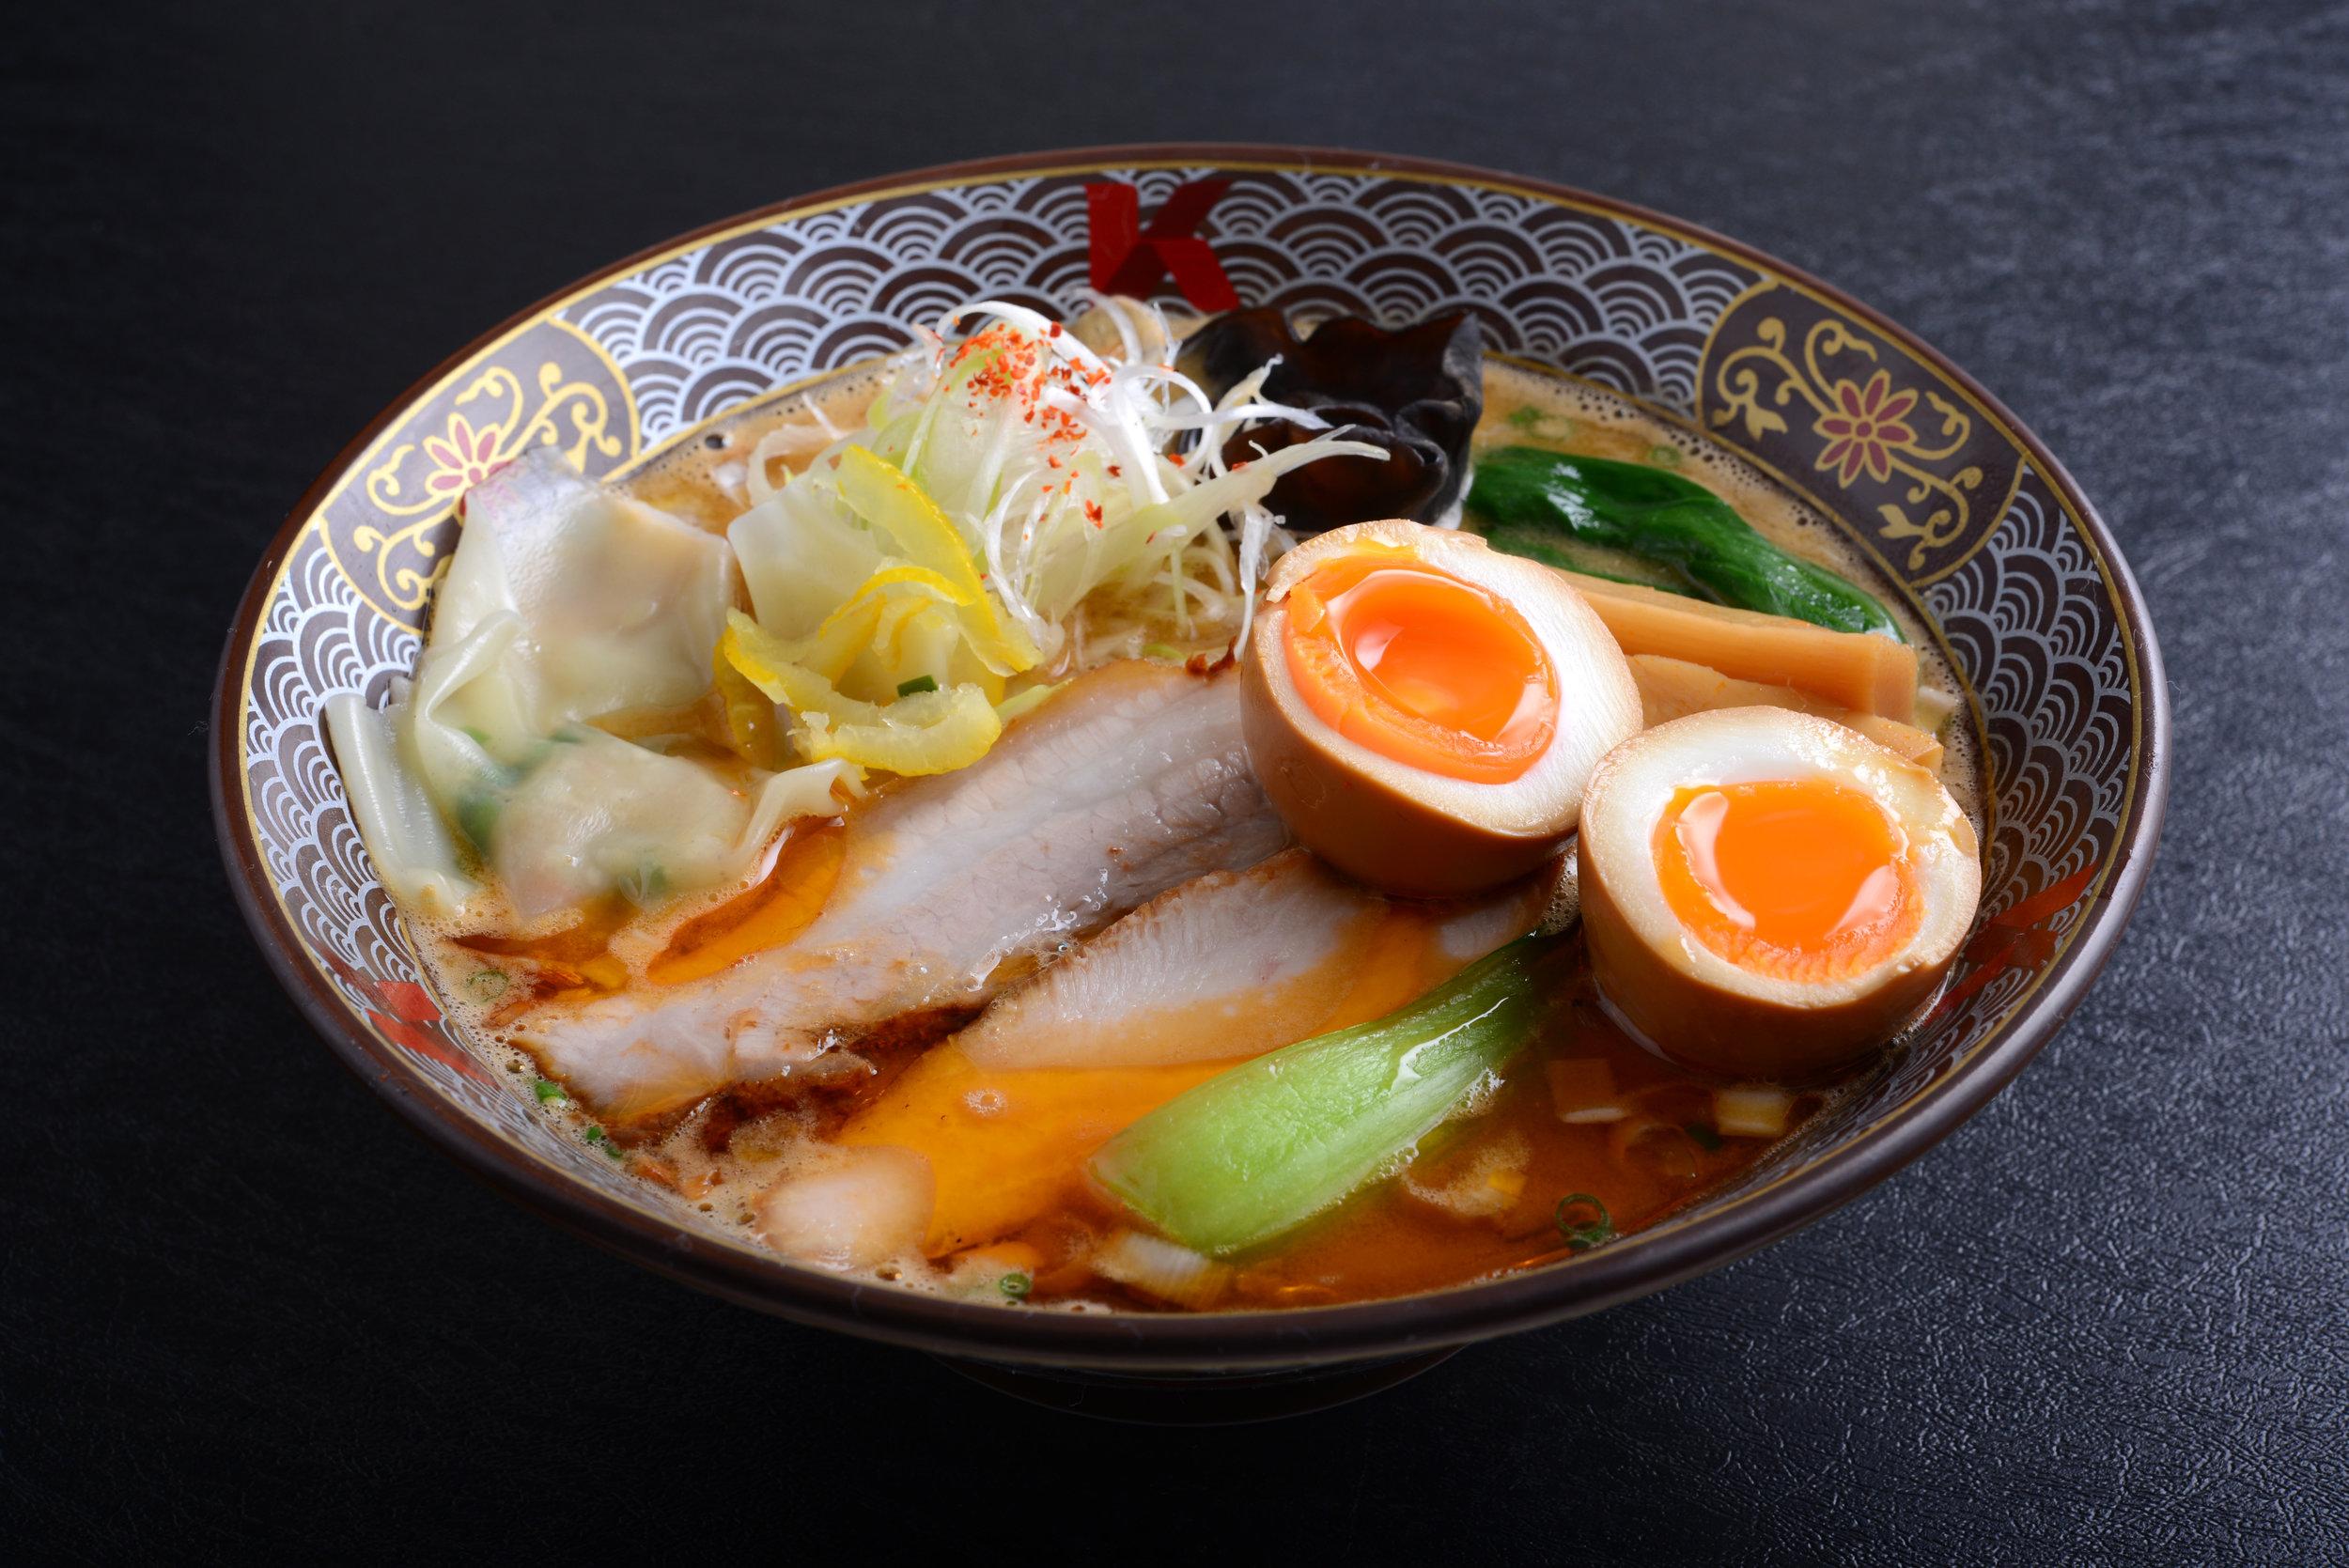 CQ_Ramen-Keisuke-Lobster-King.JPG